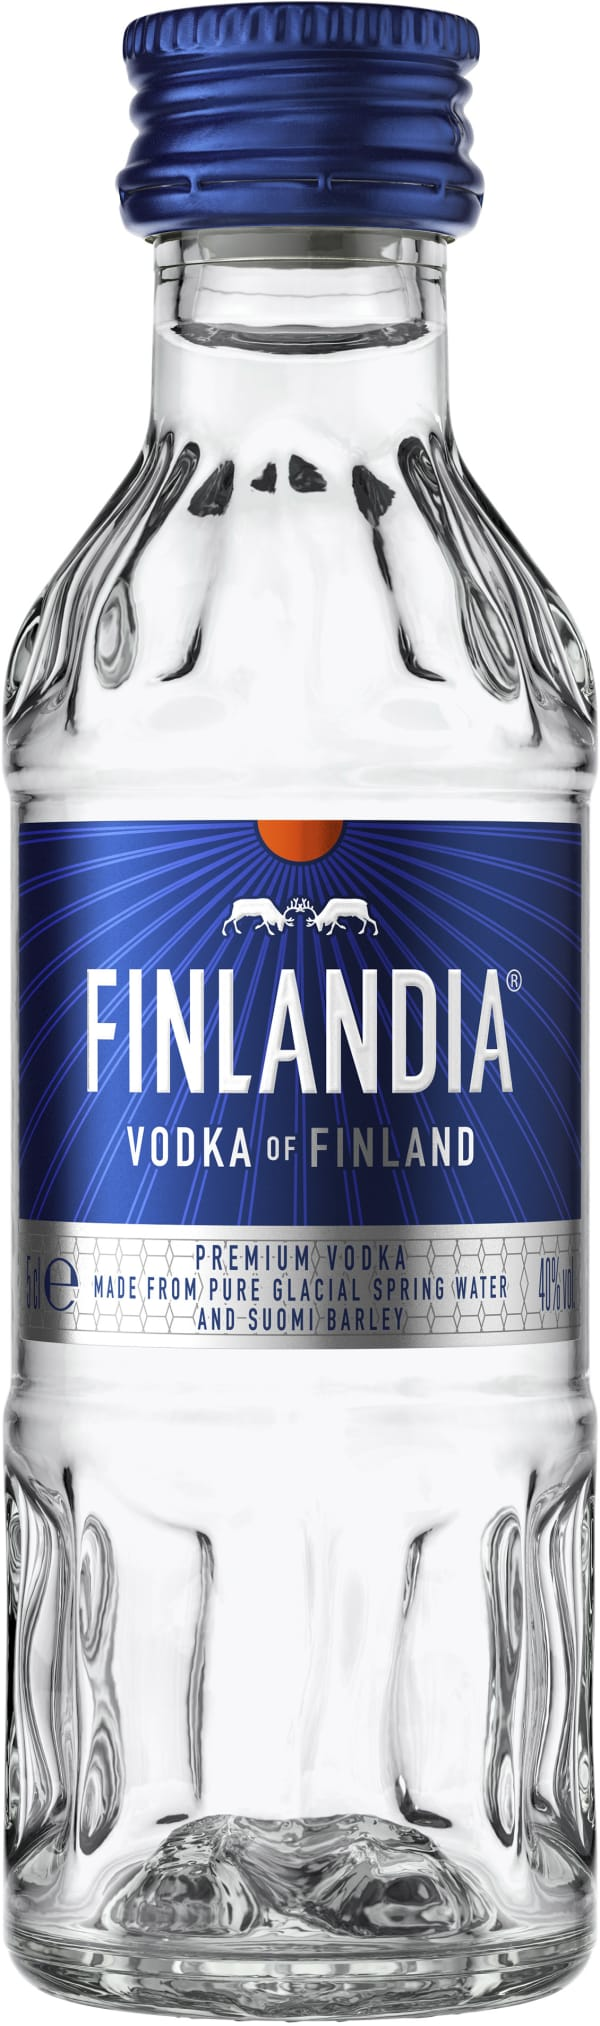 Finlandia Vodka muovipullo